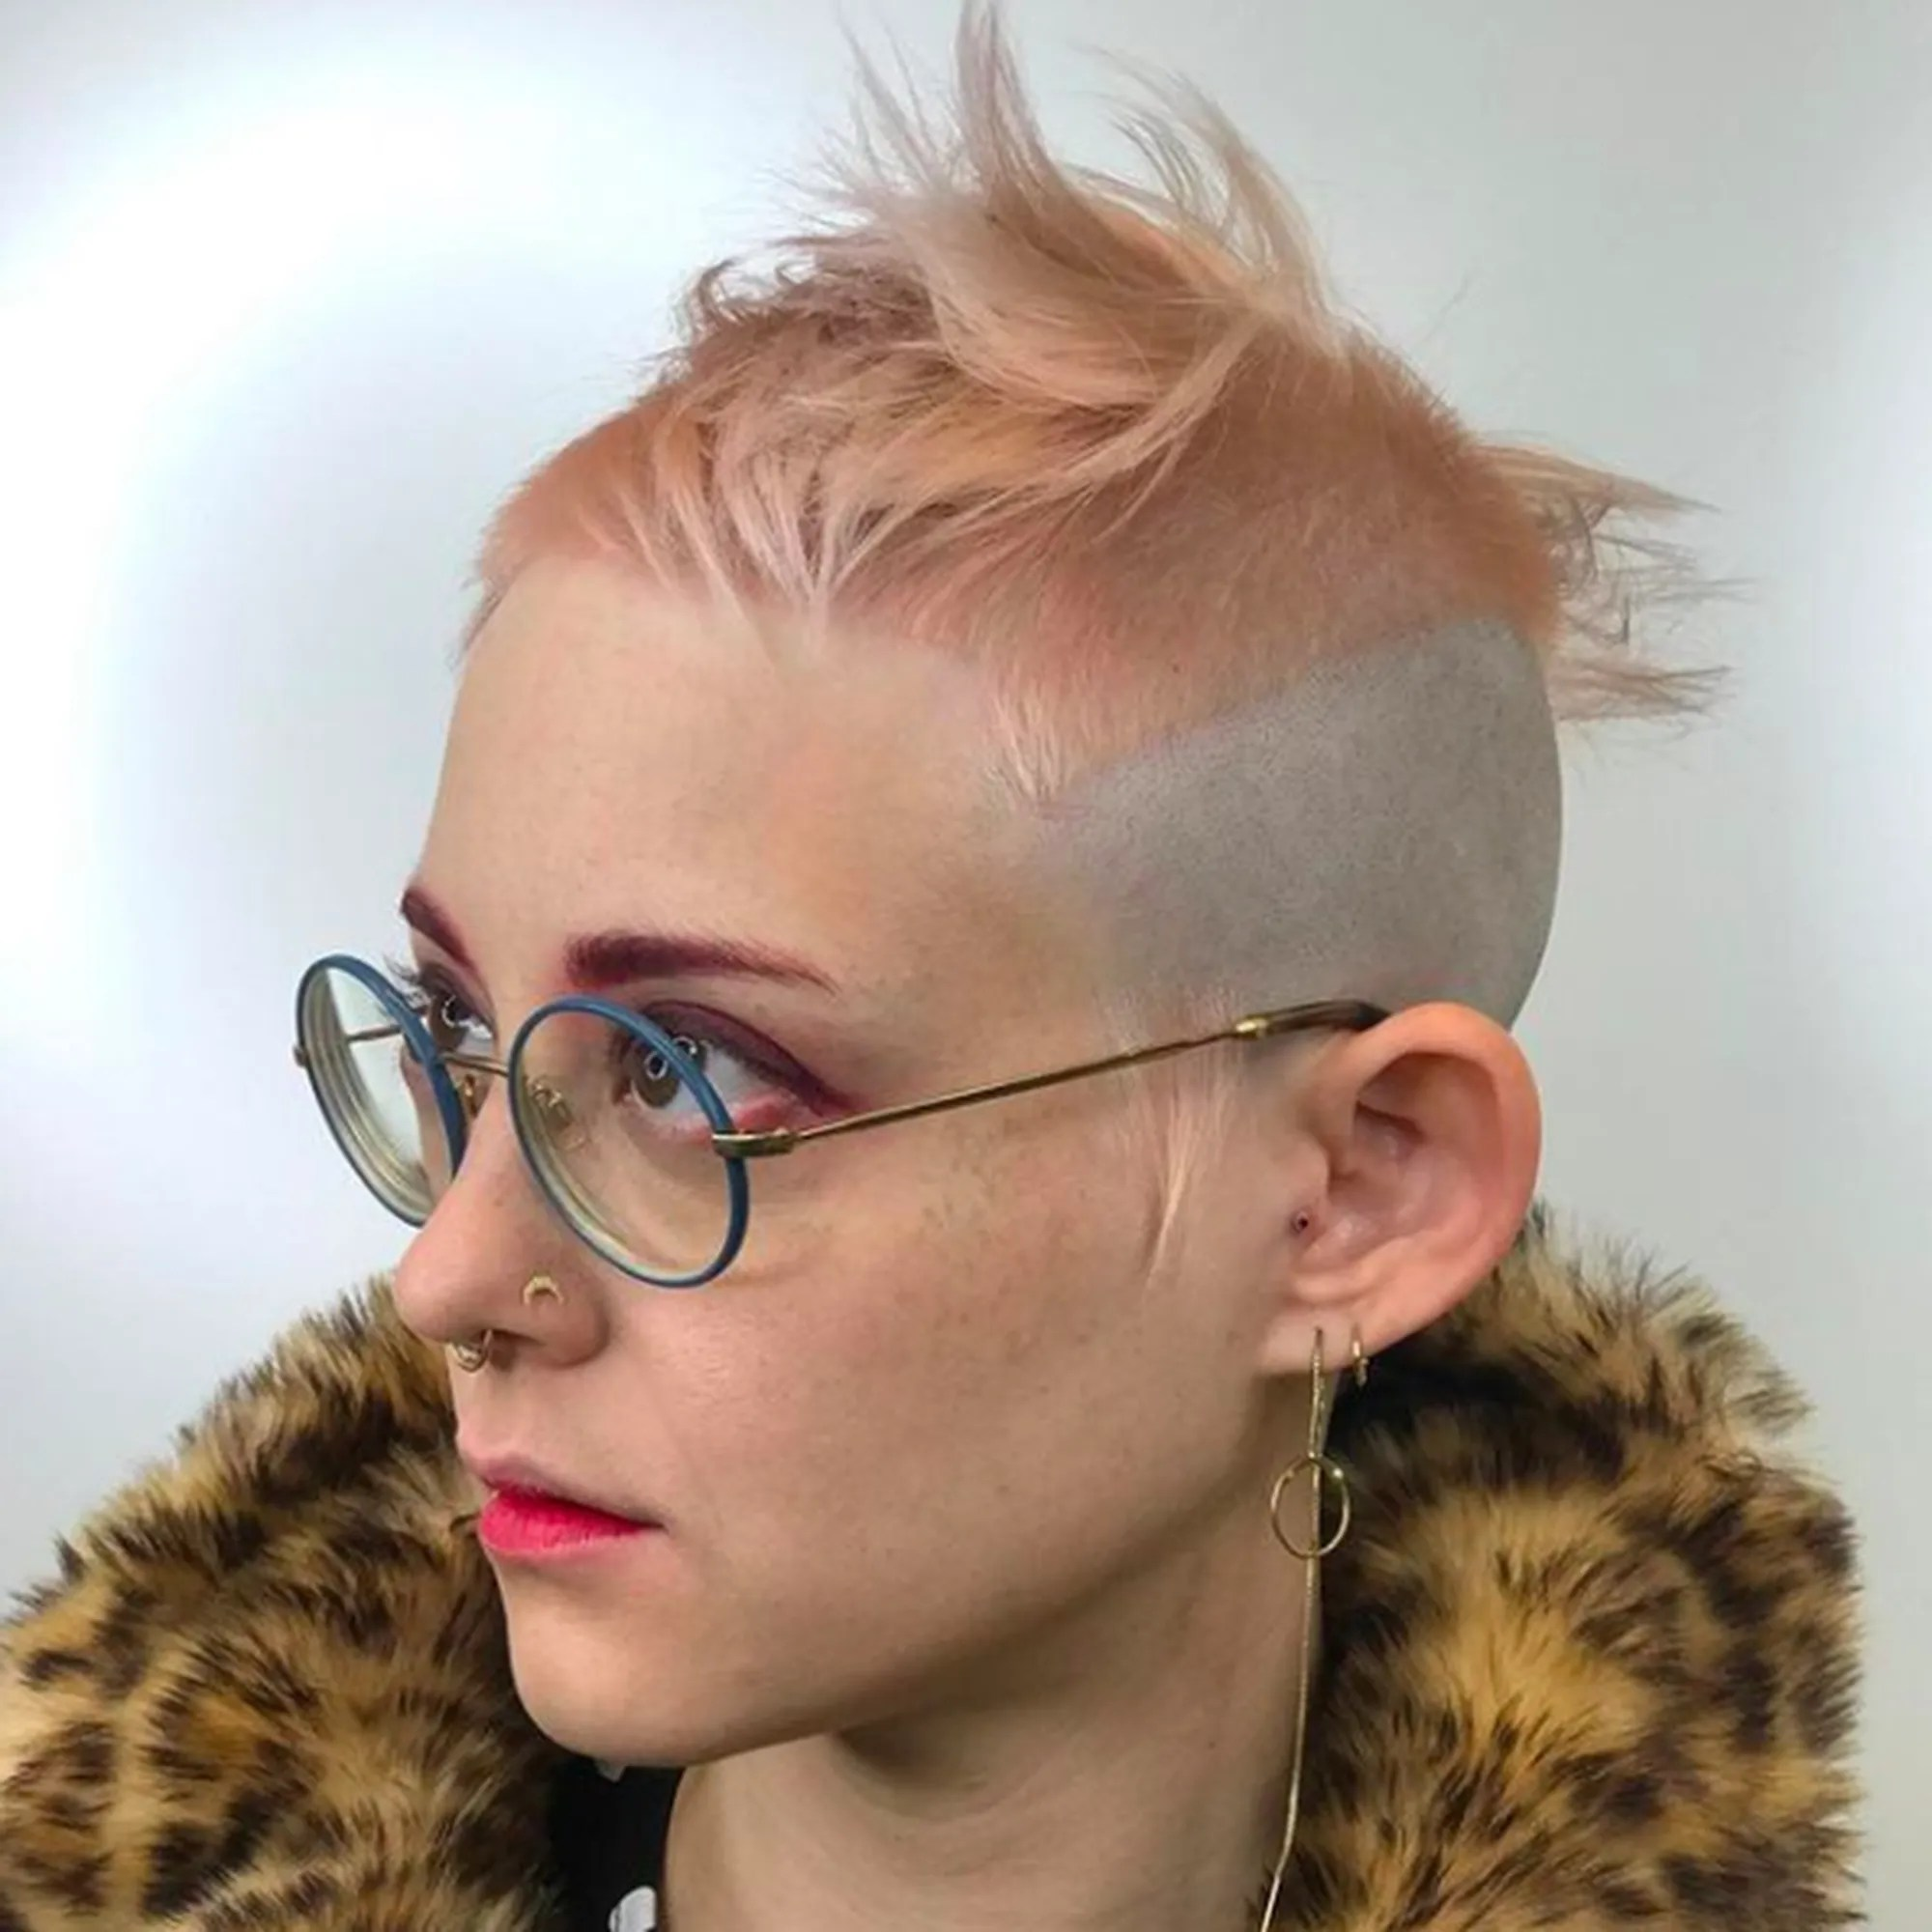 Watch This Mesmerizing Super Short Haircut Video